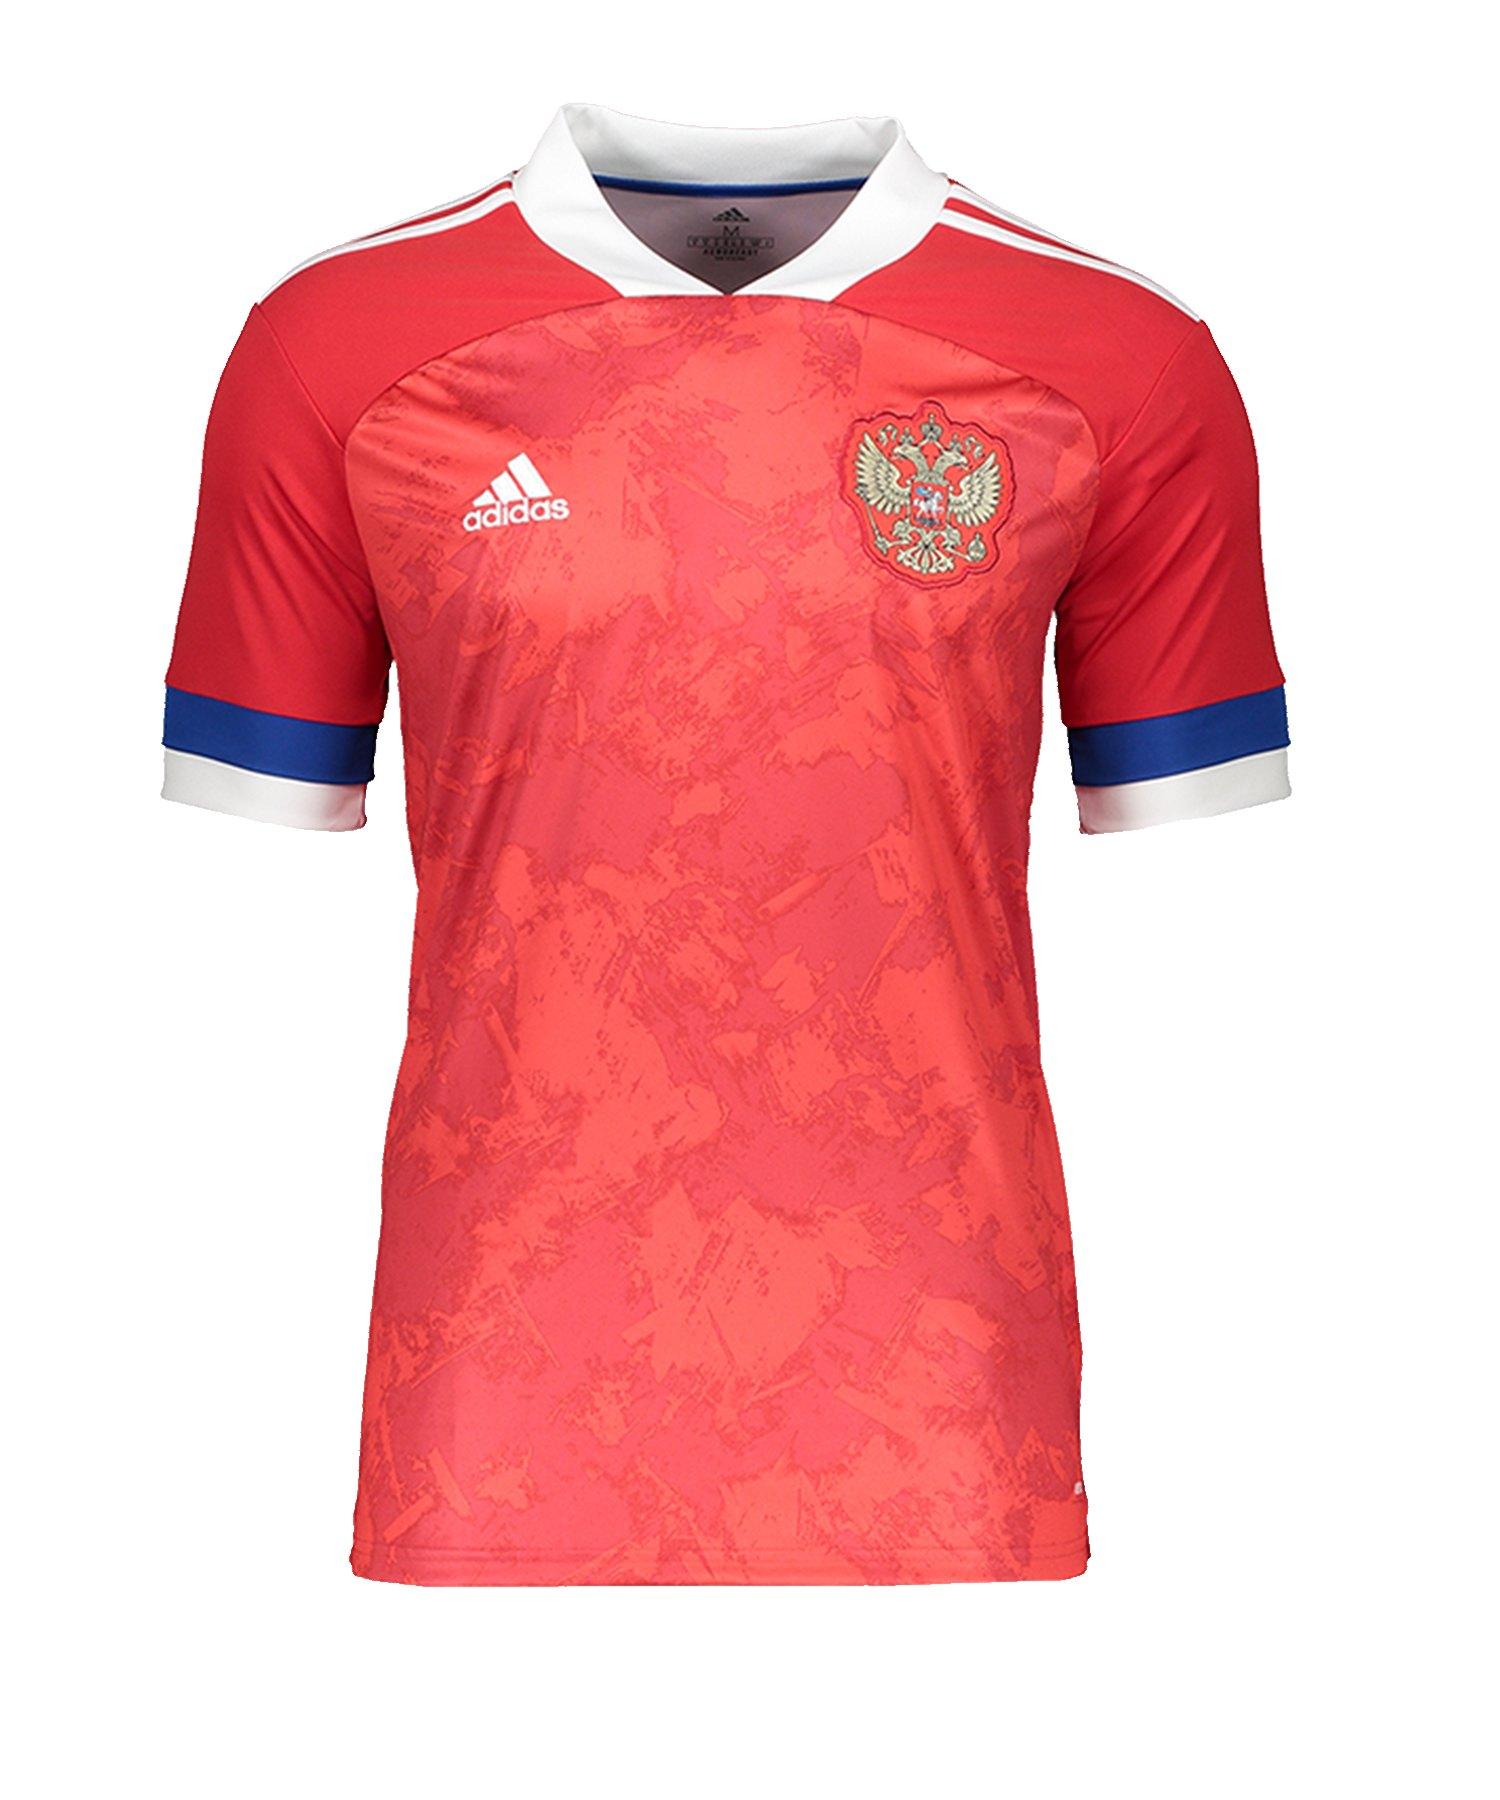 adidas Russland Trikot Home EM 2020 Kids Rot - rot